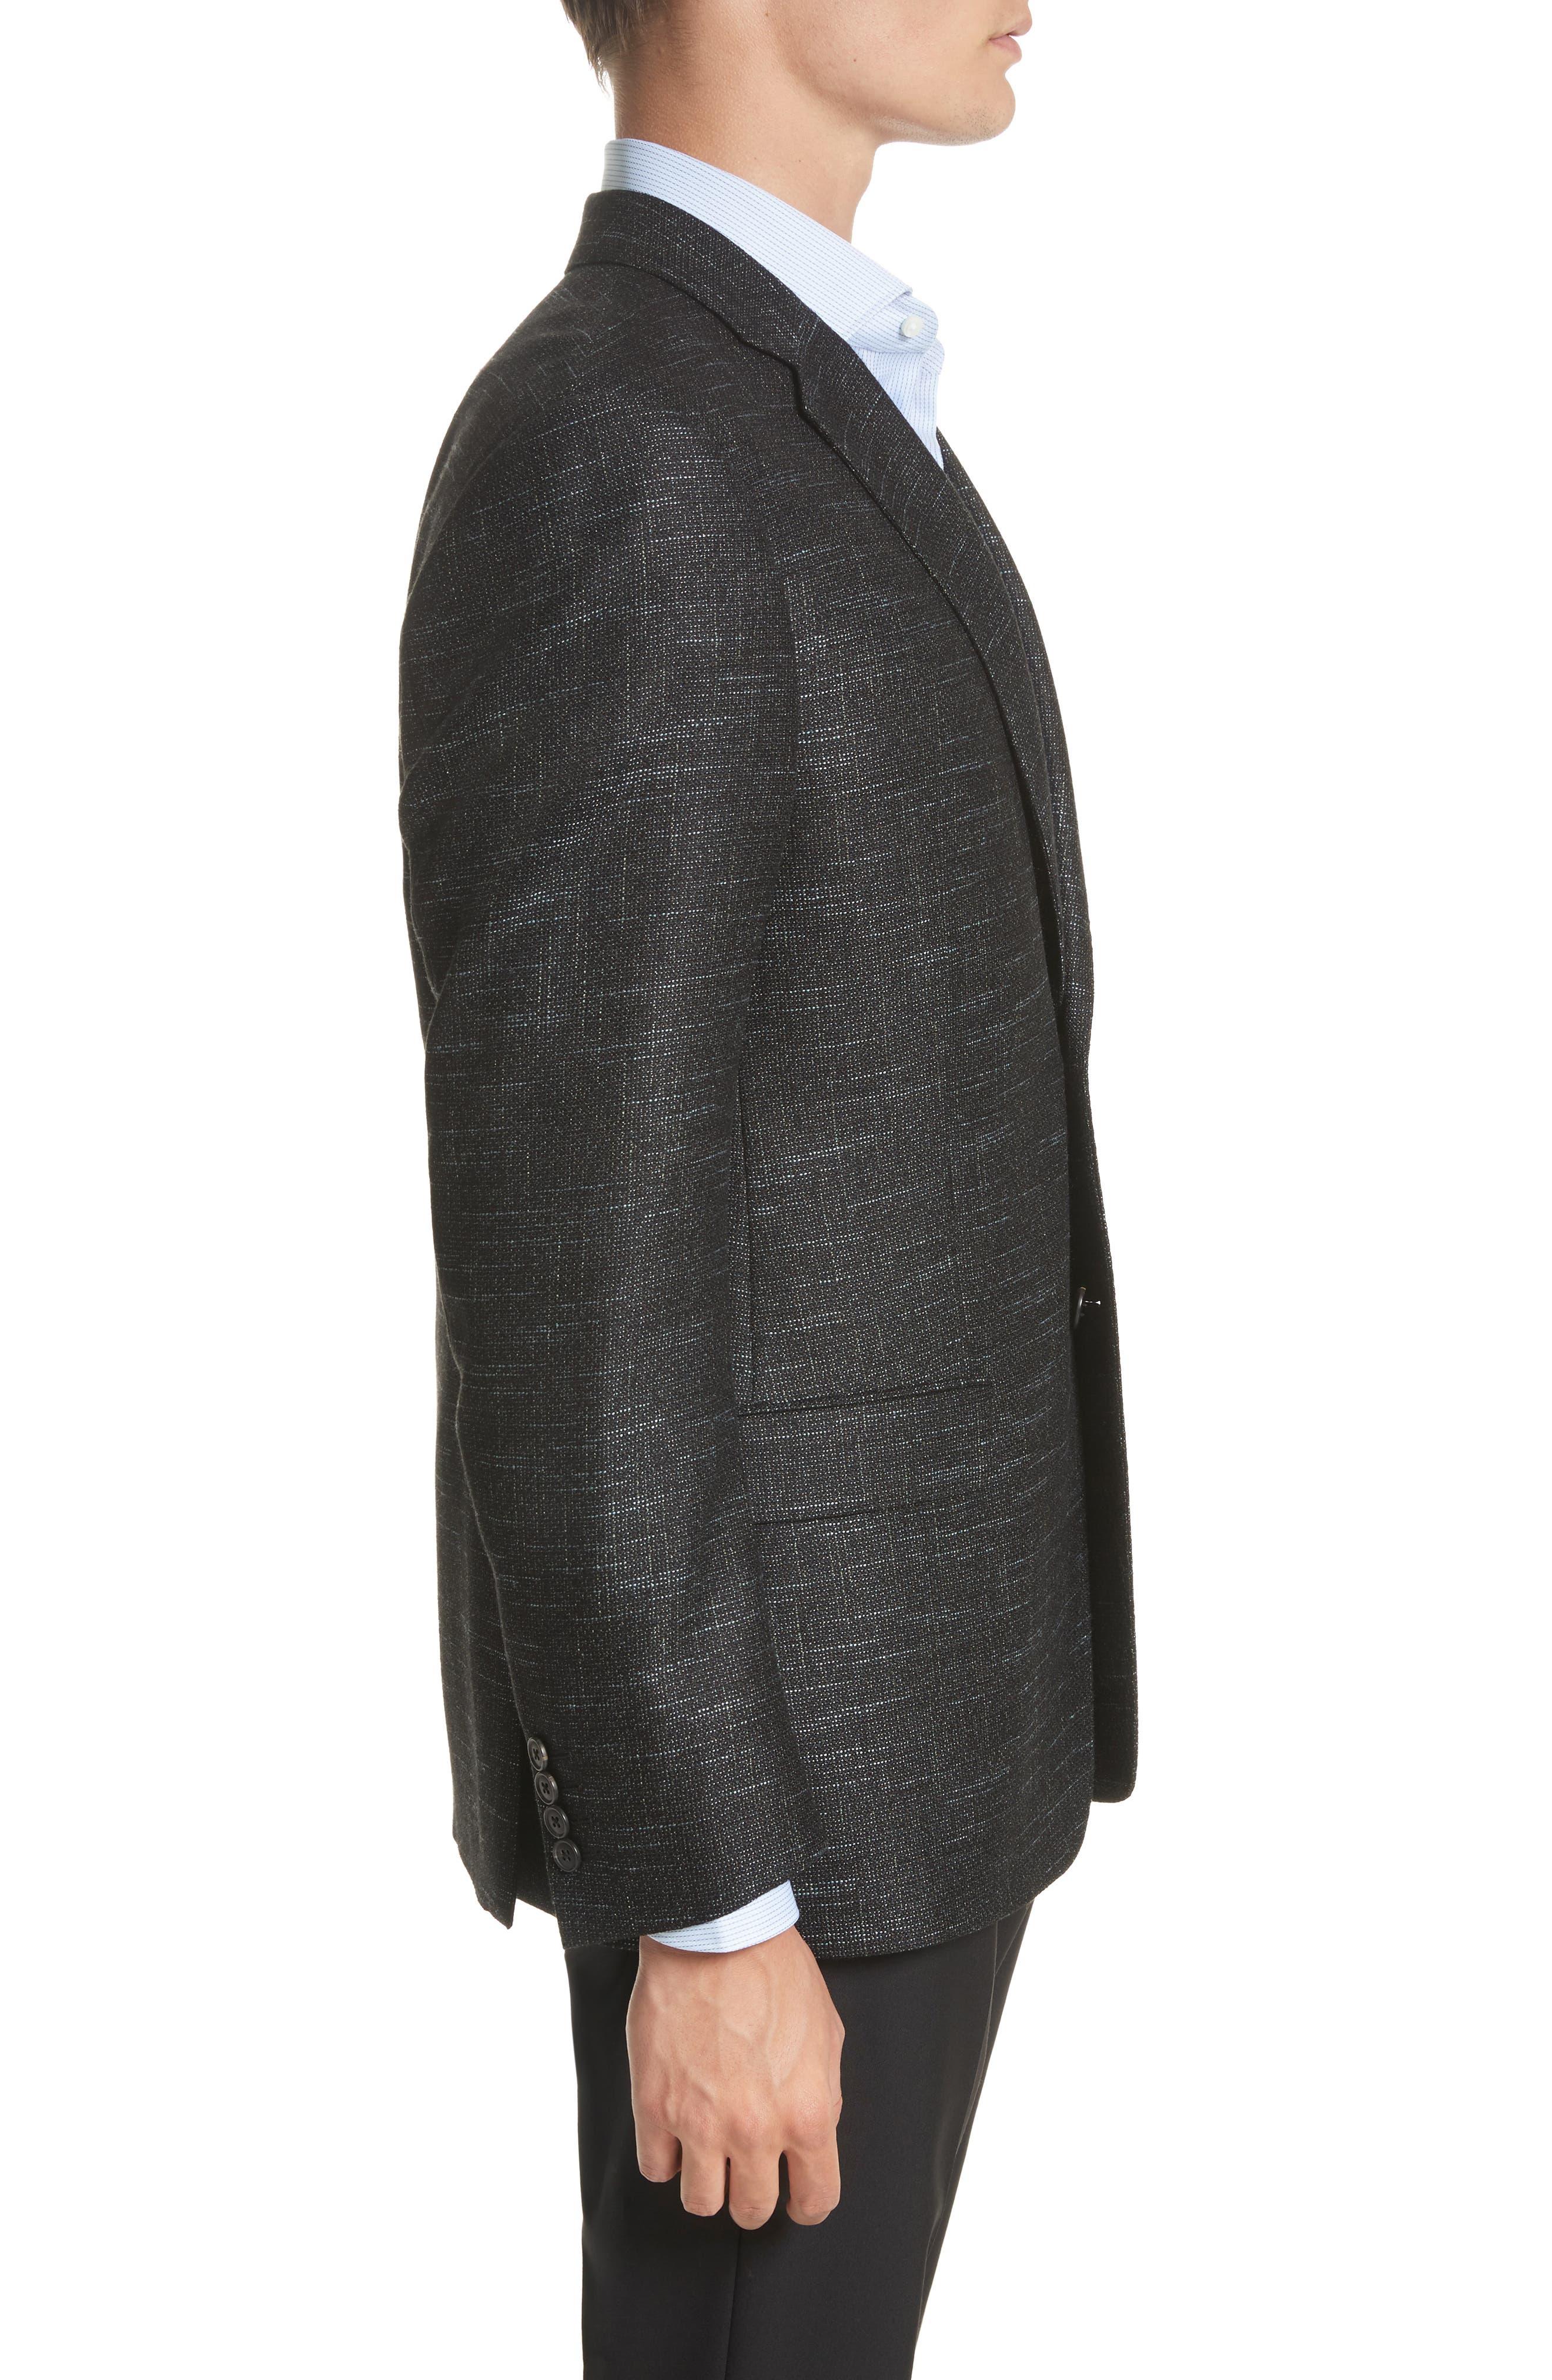 G-Line Trim Fit Wool Blend Blazer,                             Alternate thumbnail 3, color,                             355